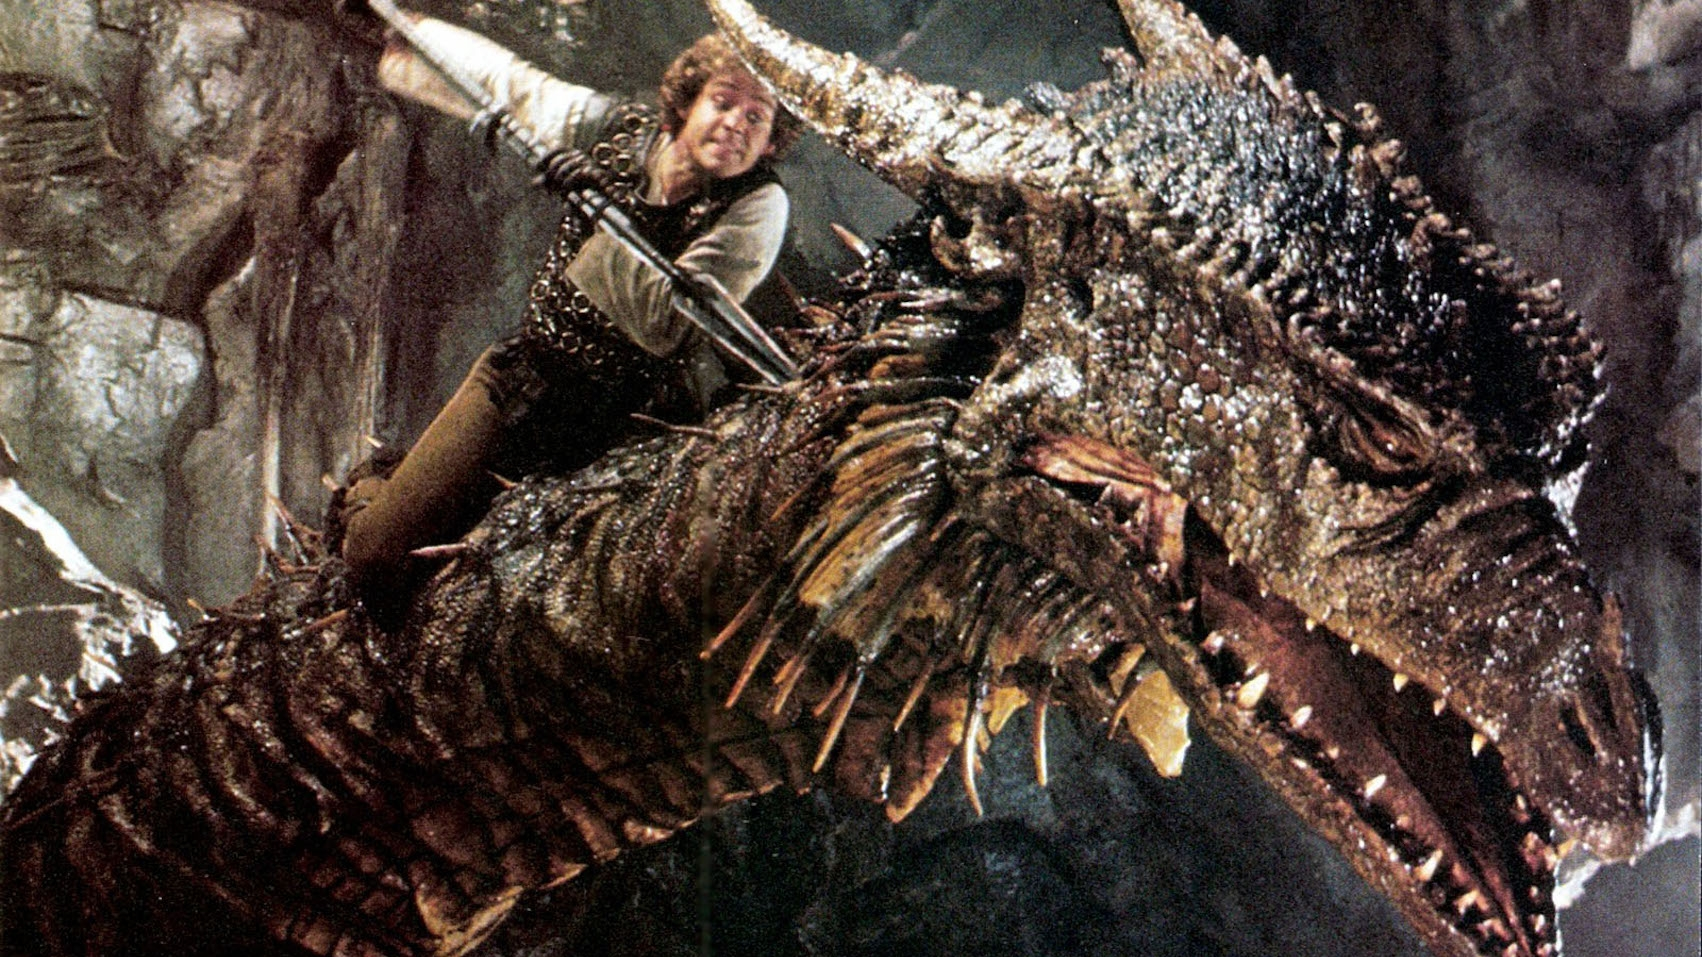 #84) Dragonslayer - (1981 - dir. Matthew Robbins)